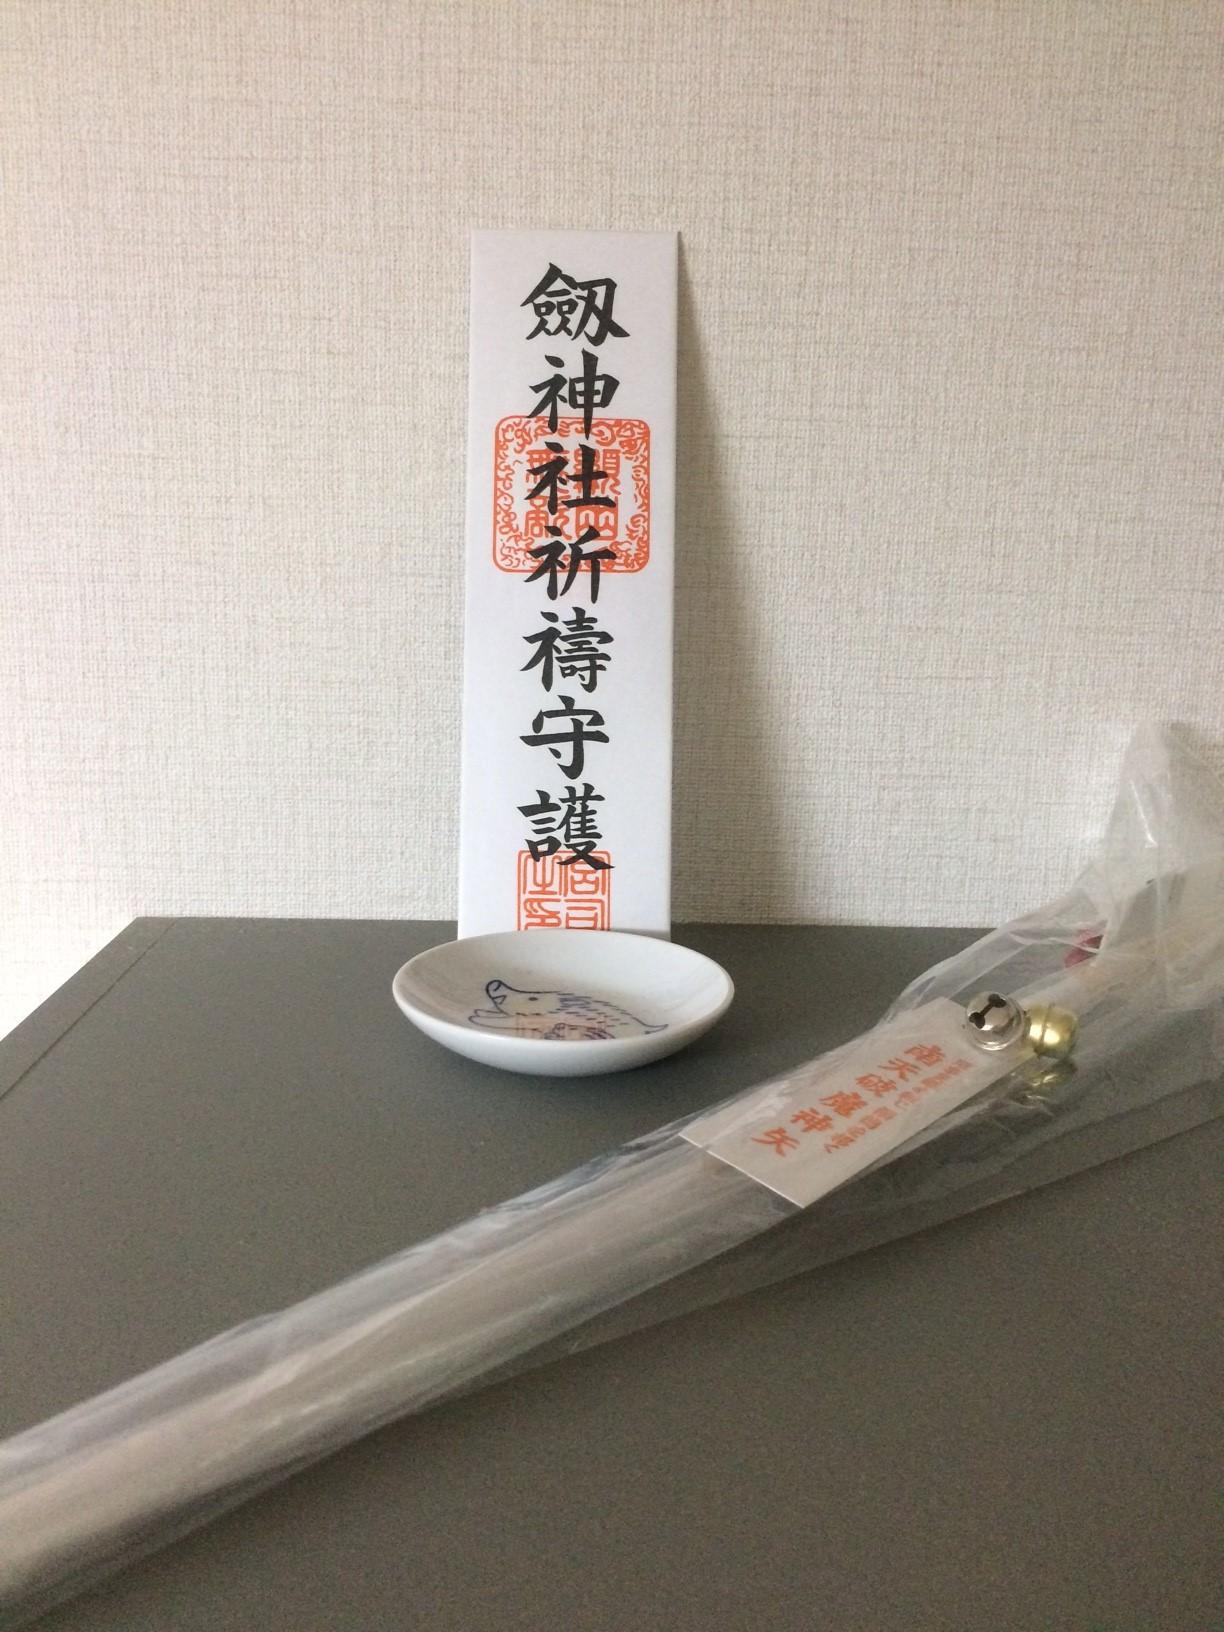 http://www.810810.co.jp/blog_run7/2019010701/%E6%AD%A3%E6%9C%88.JPG